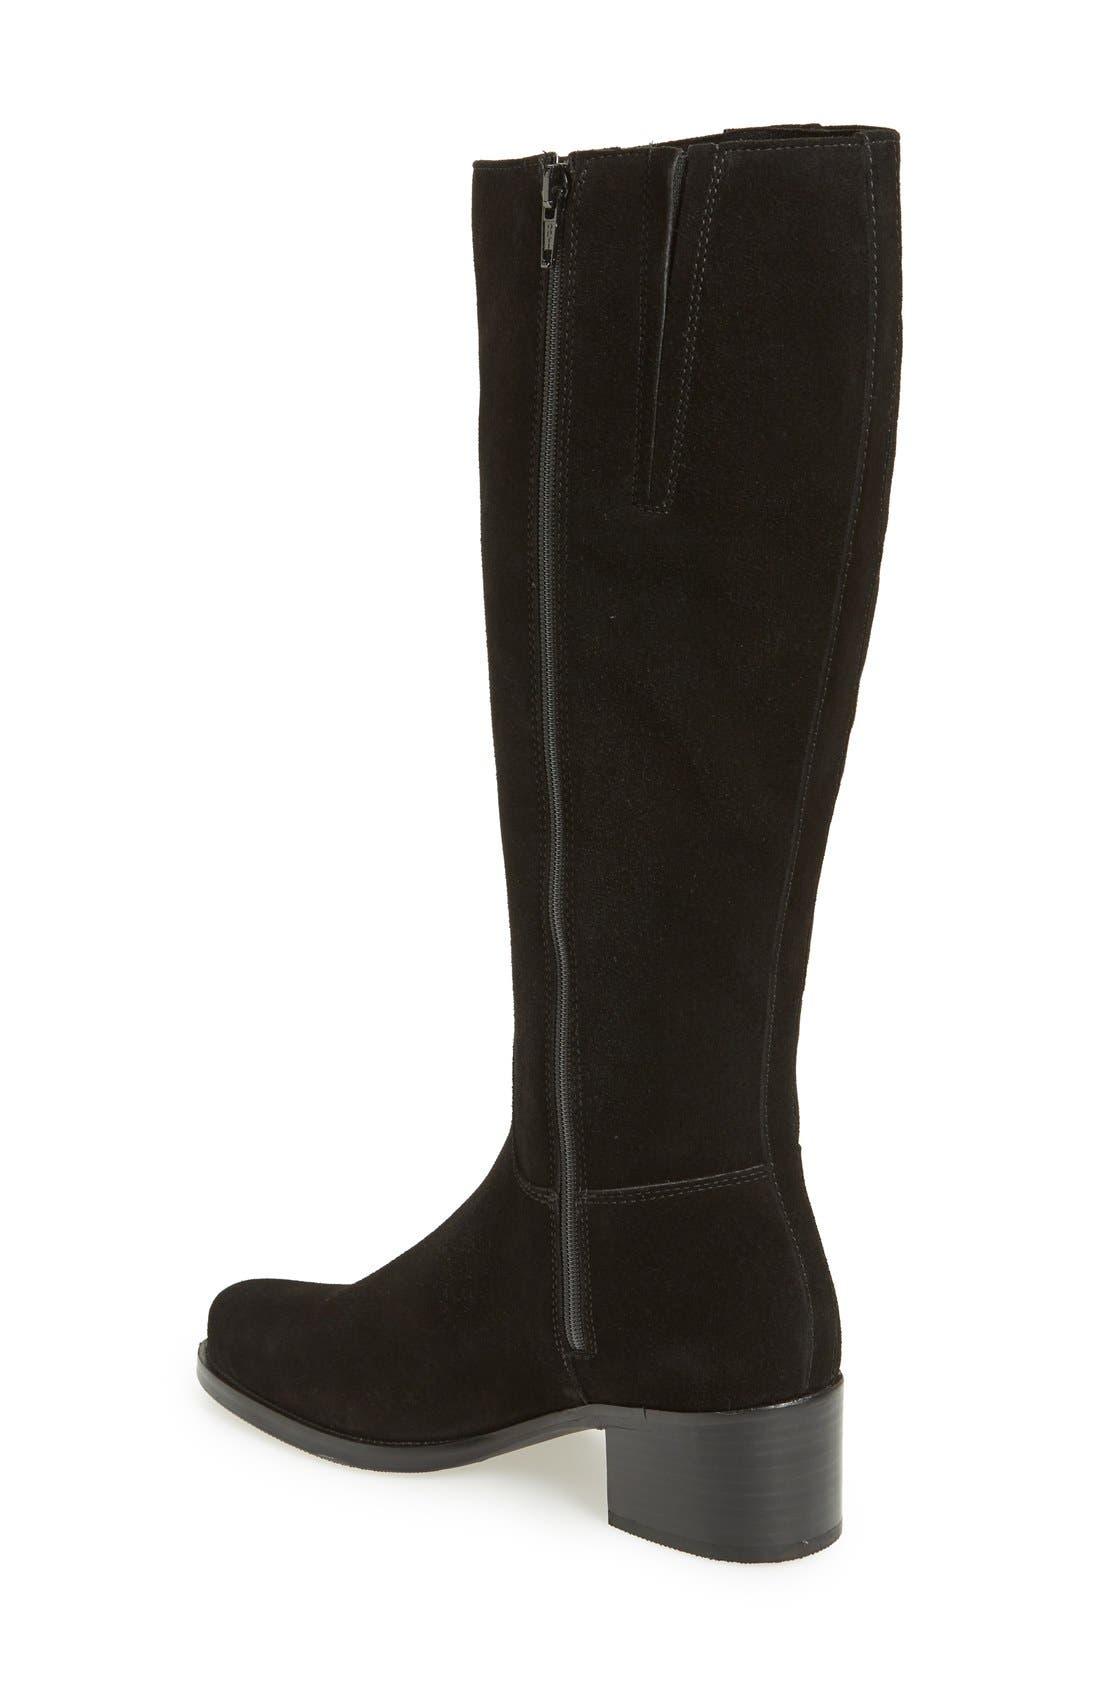 Alternate Image 2  - La Canadienne 'Polly' Waterproof Knee High Boot (Women)